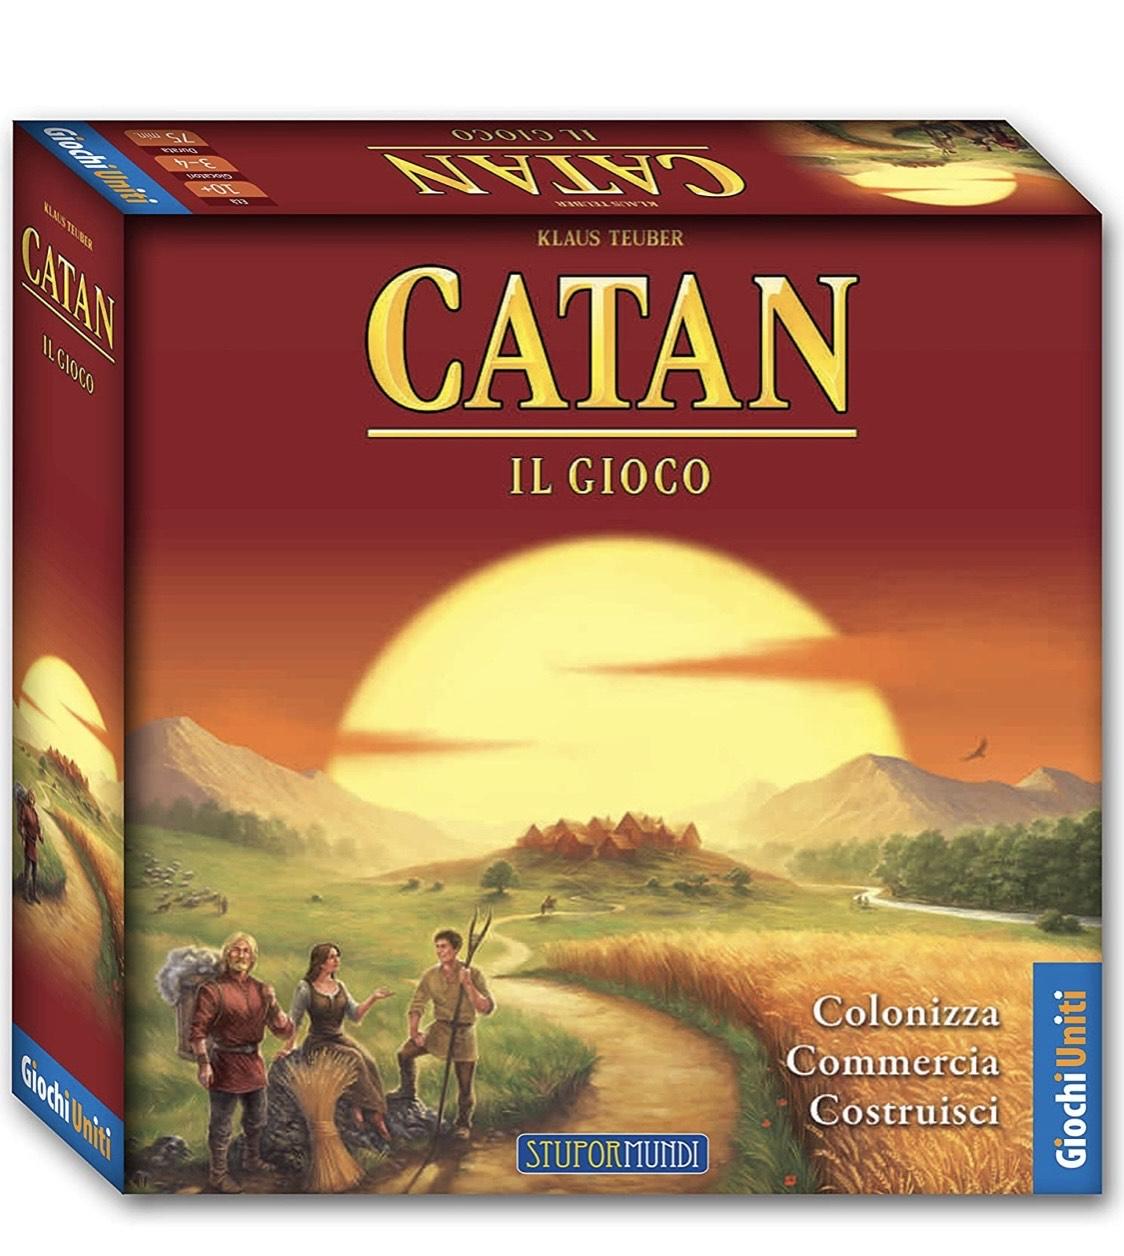 Catan Italiano por 22,17 €